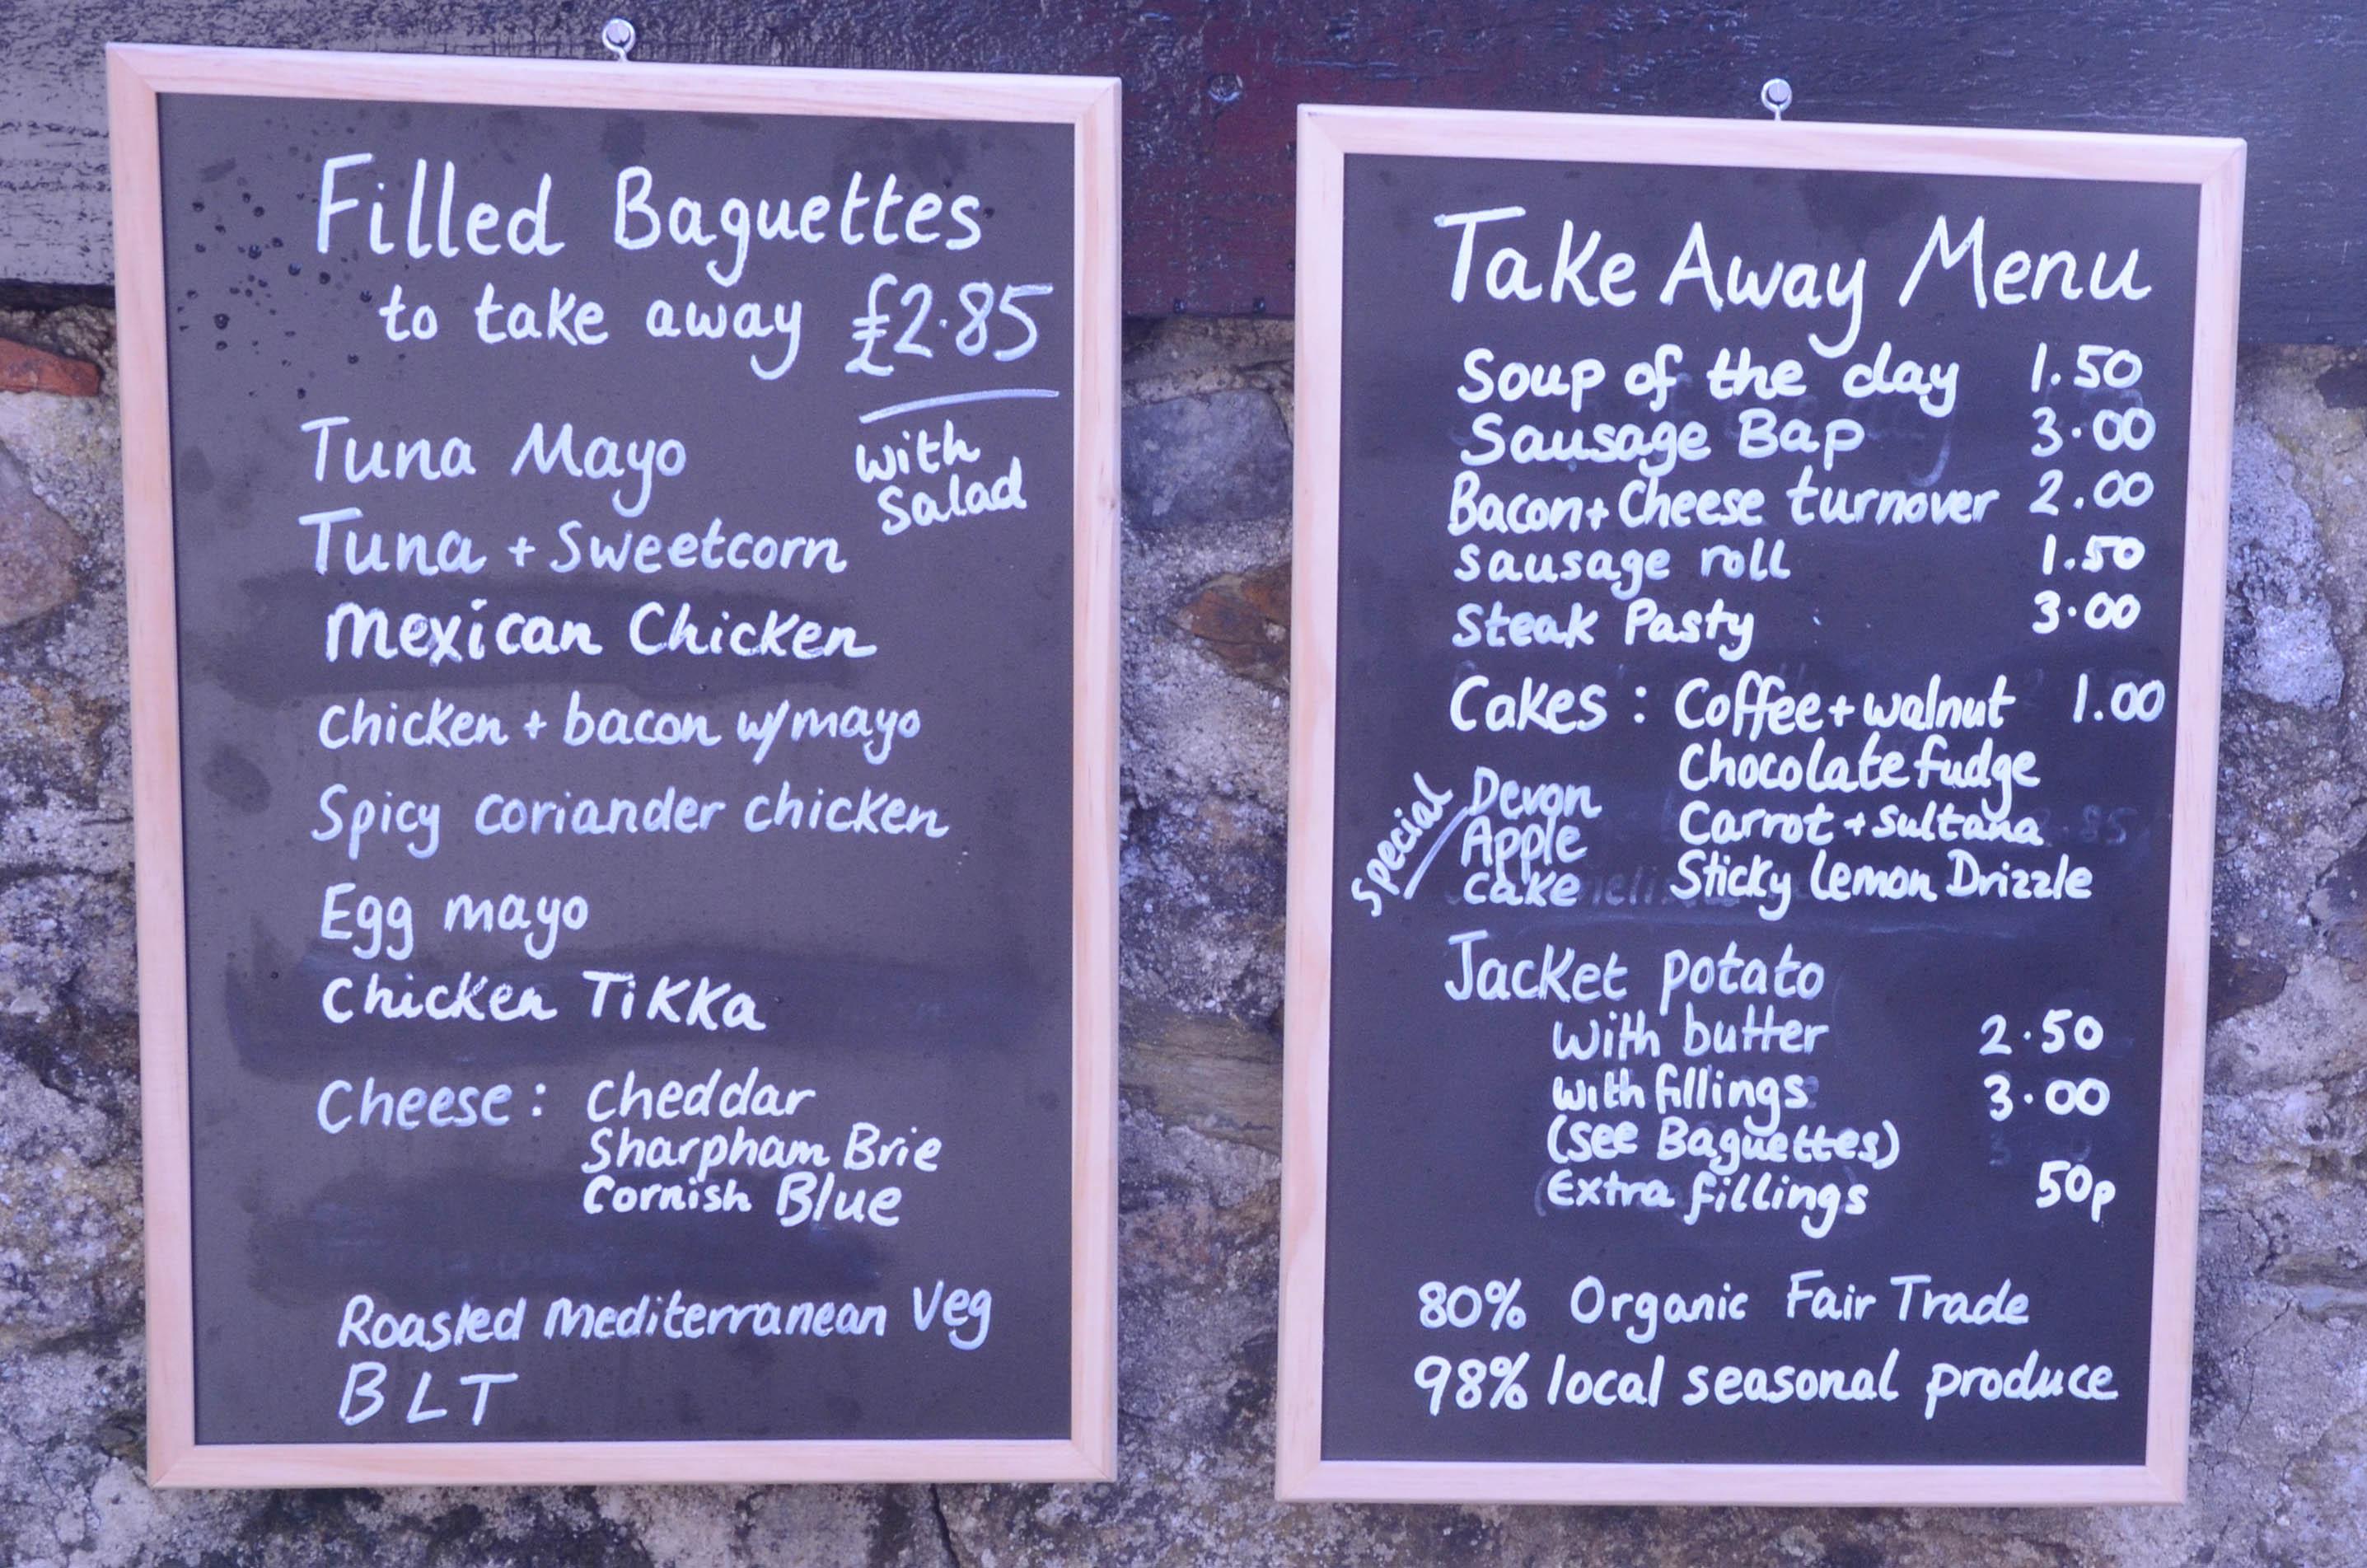 Home Farm Cafe Parke Bovey Tracey A Dartmoor Blog